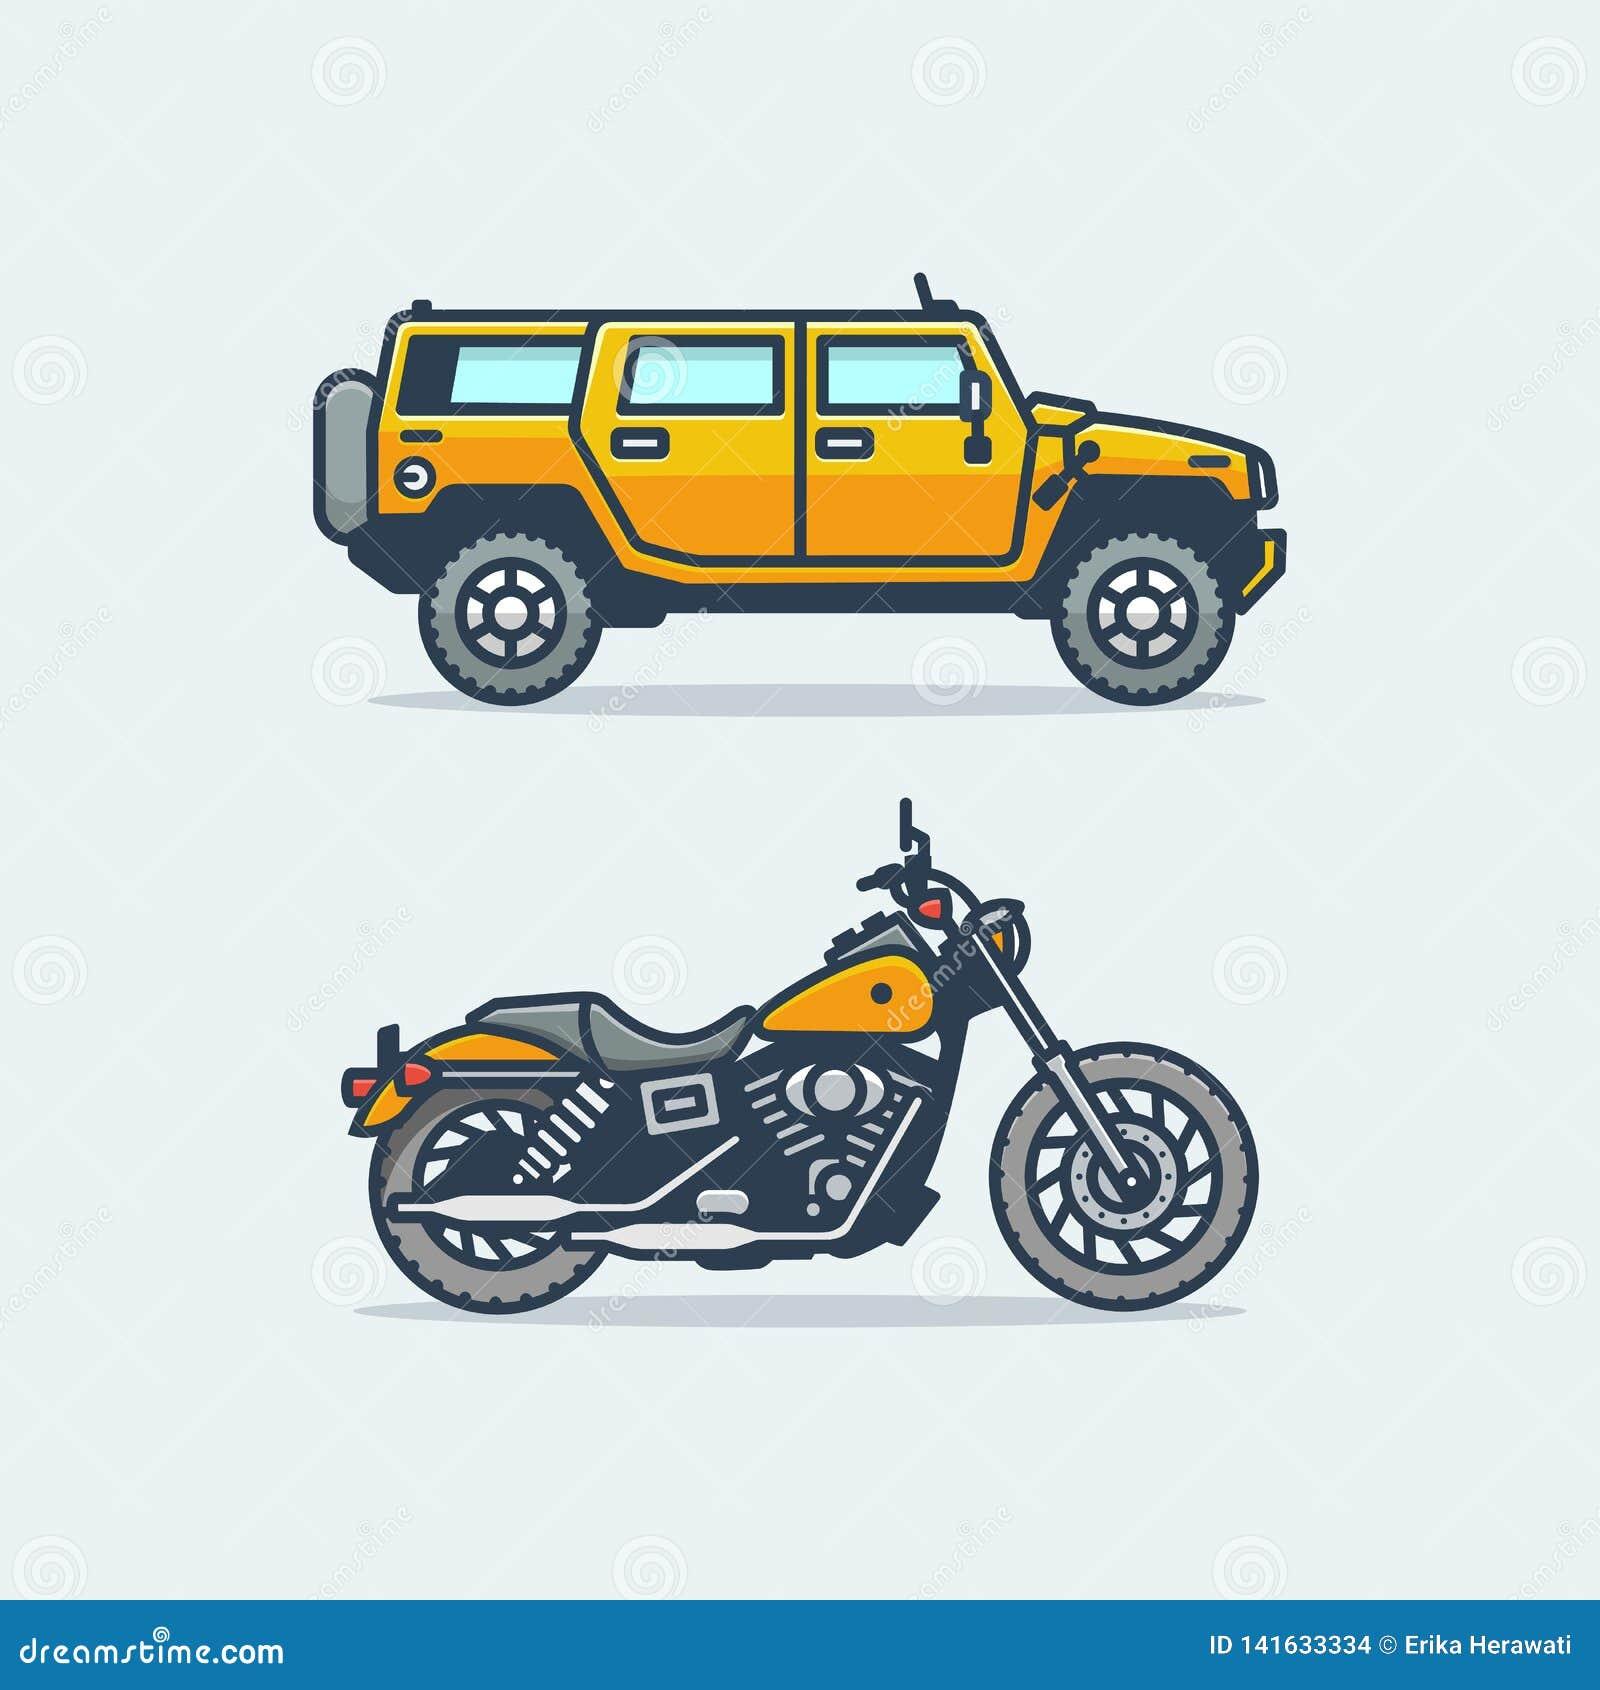 Man Toys illustration Concept illustration vector template